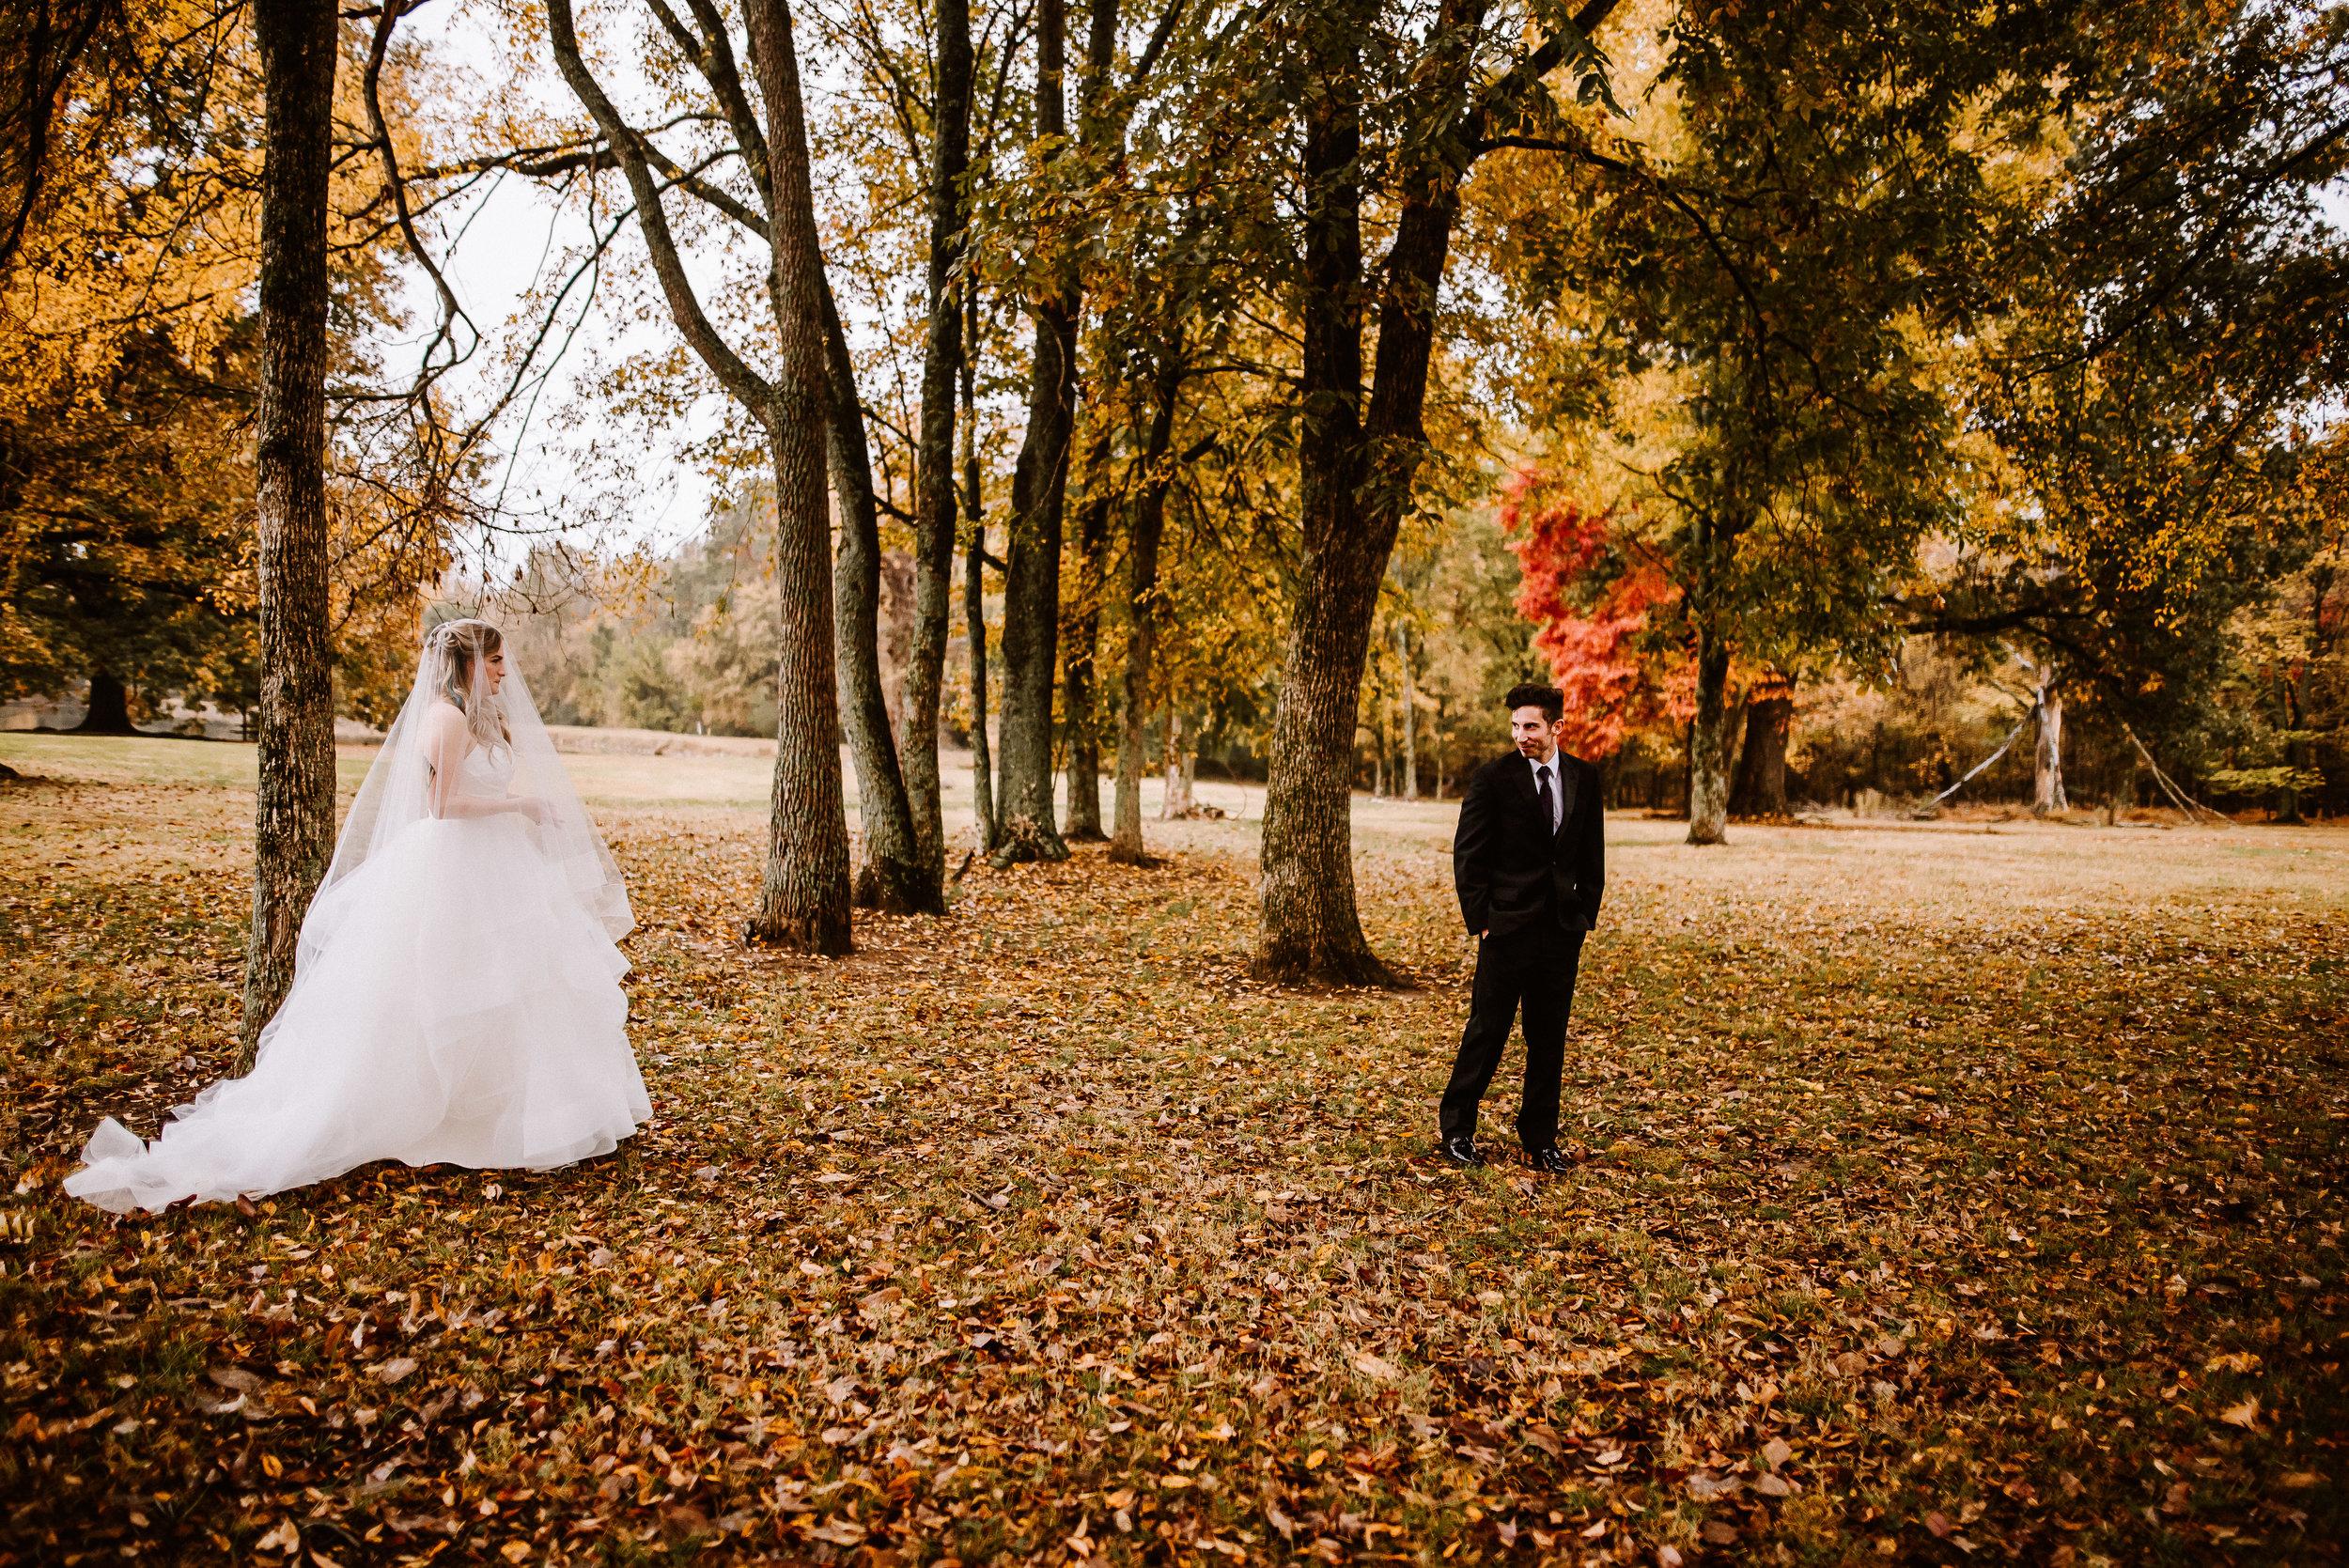 Lucchesi-Wedding_Shelby-Farms_Ashley-Benham-Photography-118.jpg